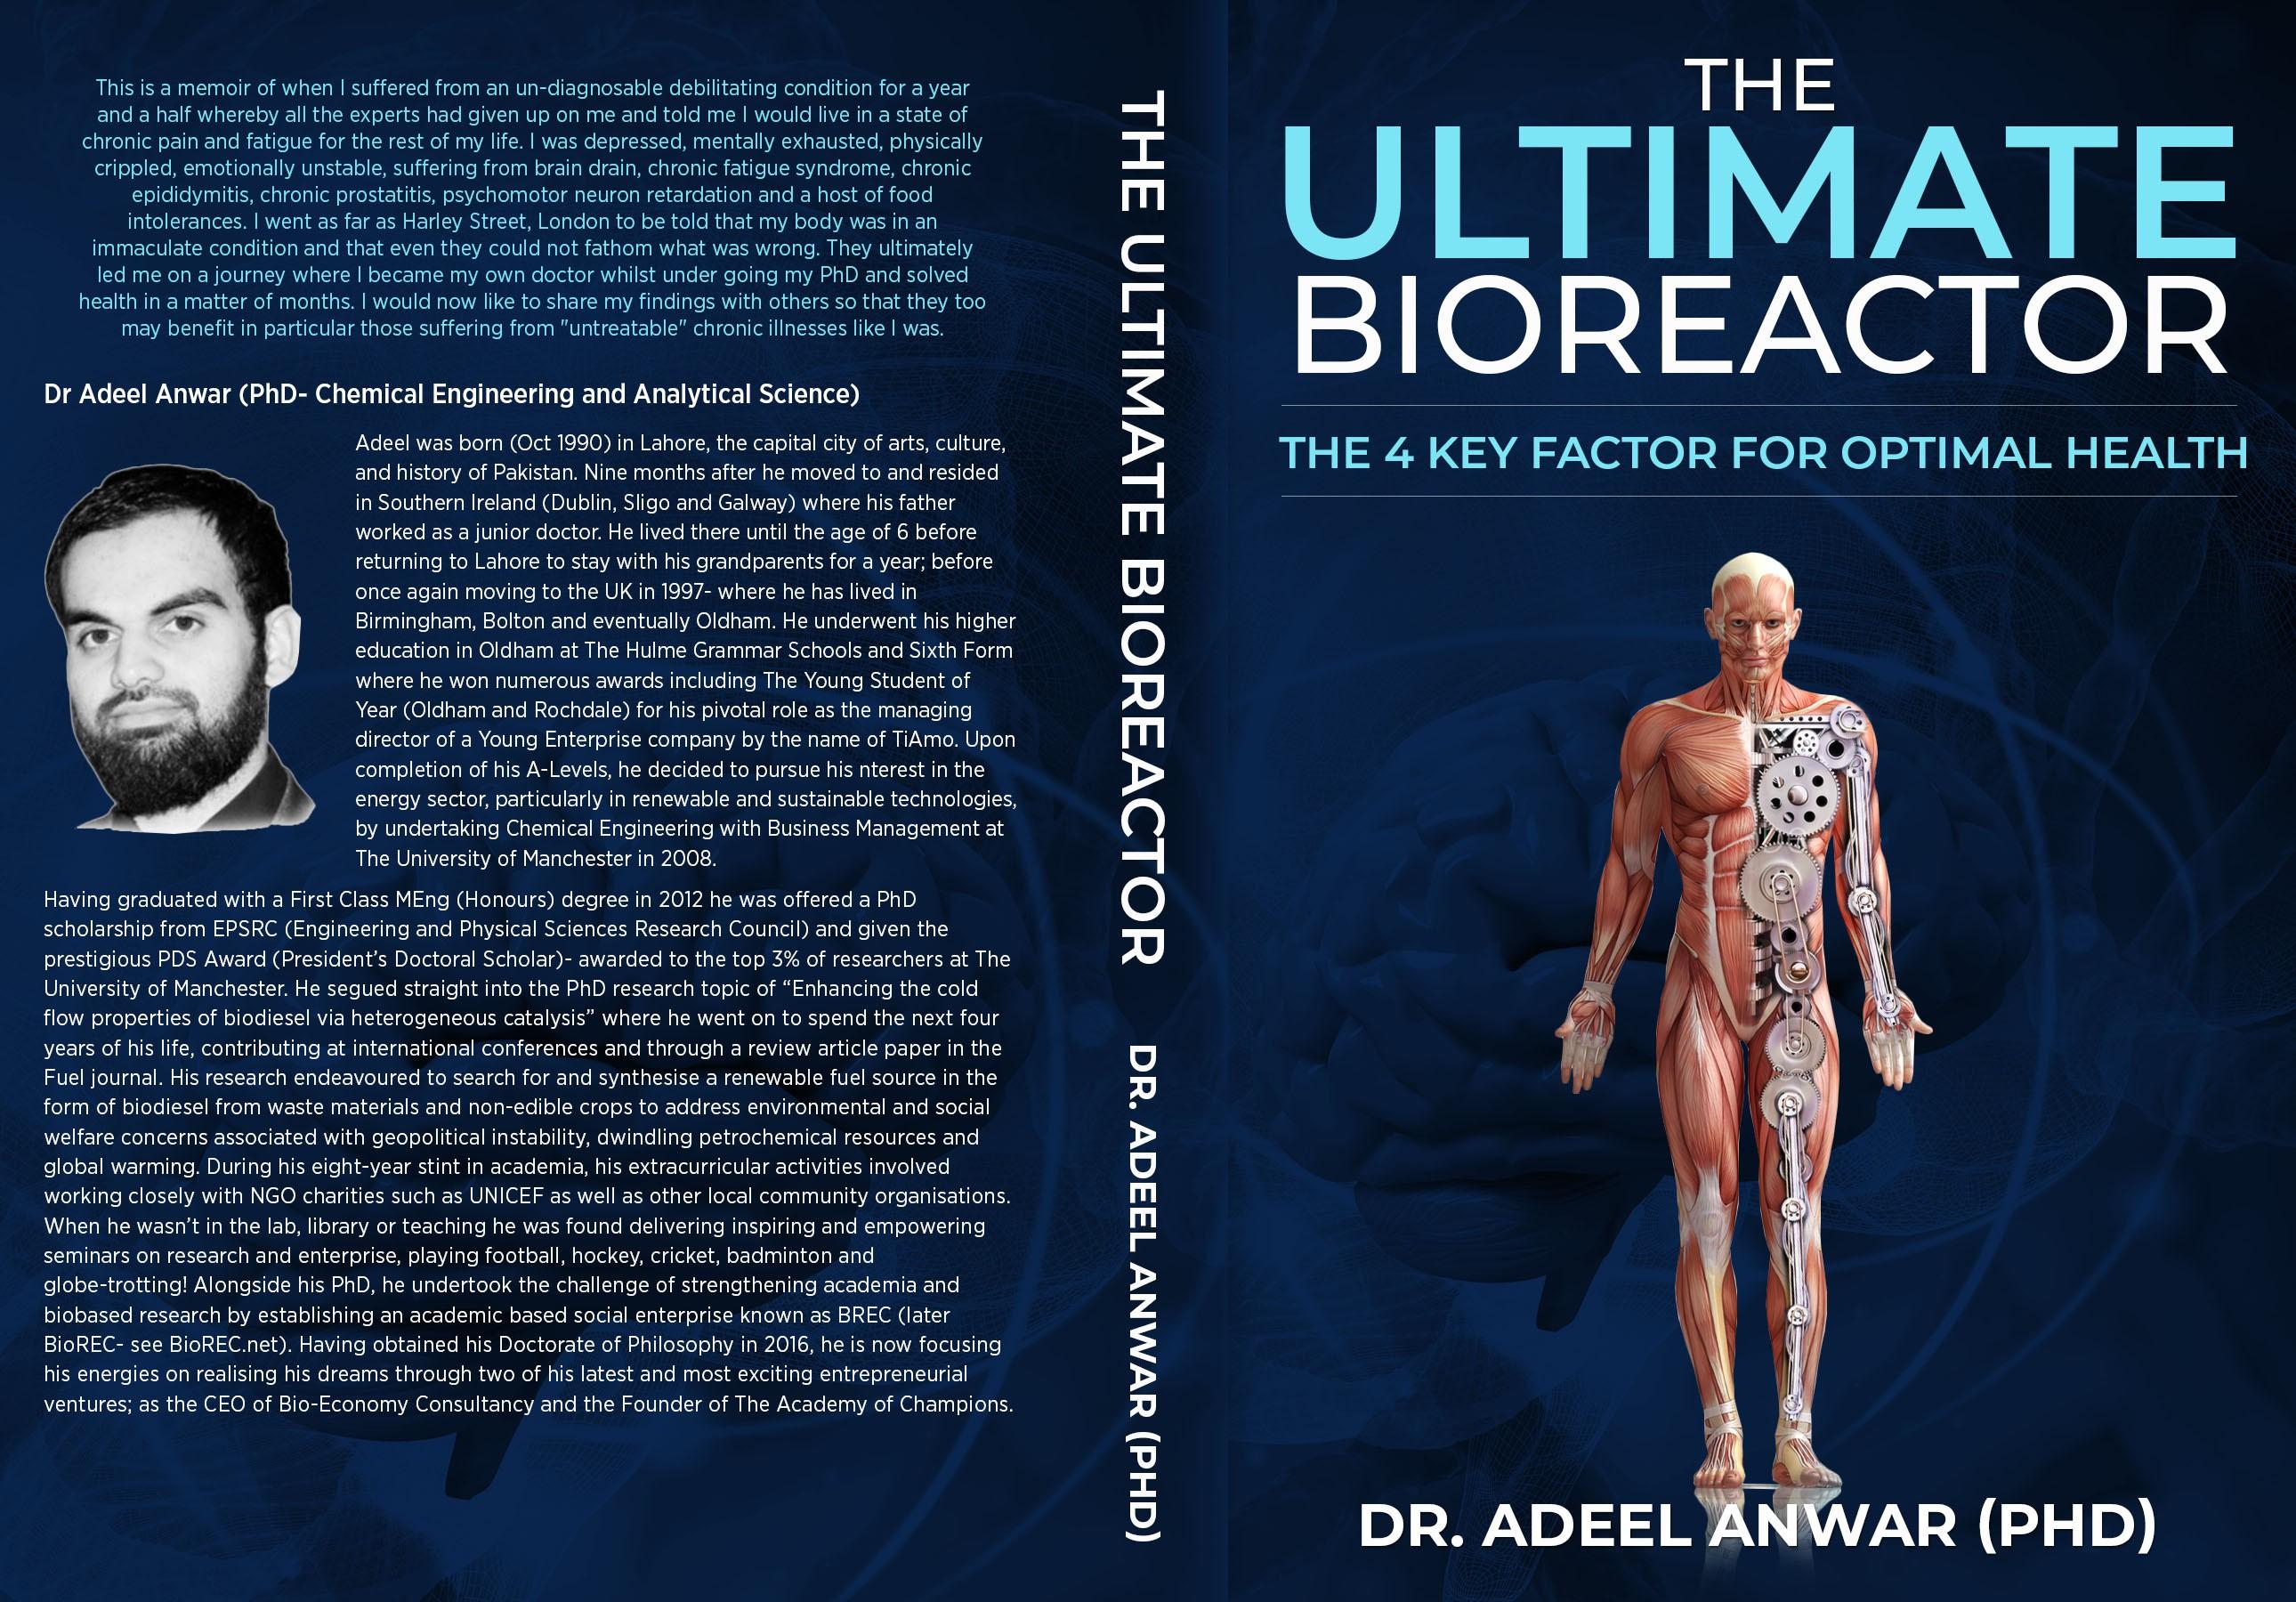 Create a memorable masterpiece for The Ultimate Bioreactor